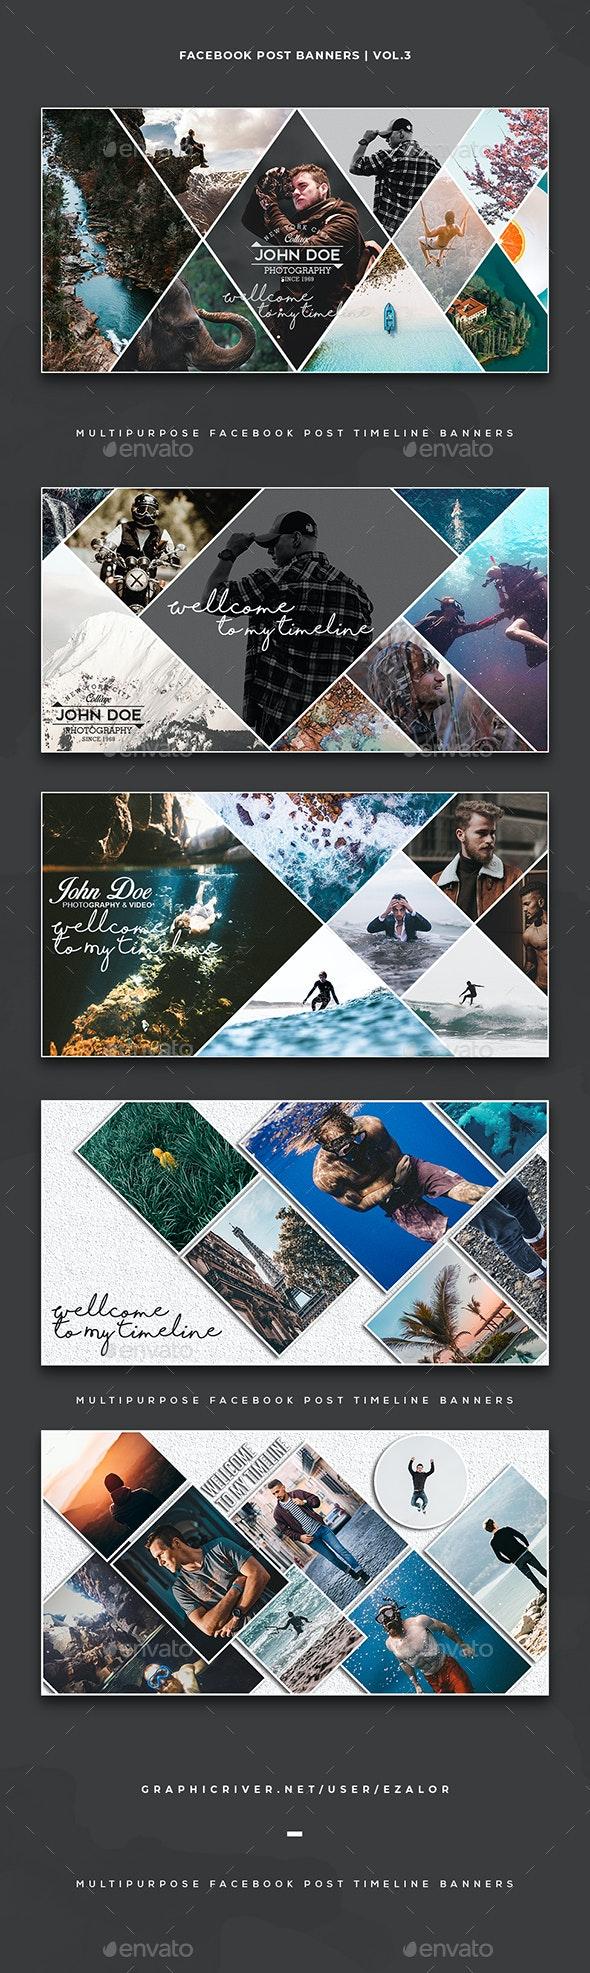 Facebook Post Banners Vol. 3 - Facebook Timeline Covers Social Media